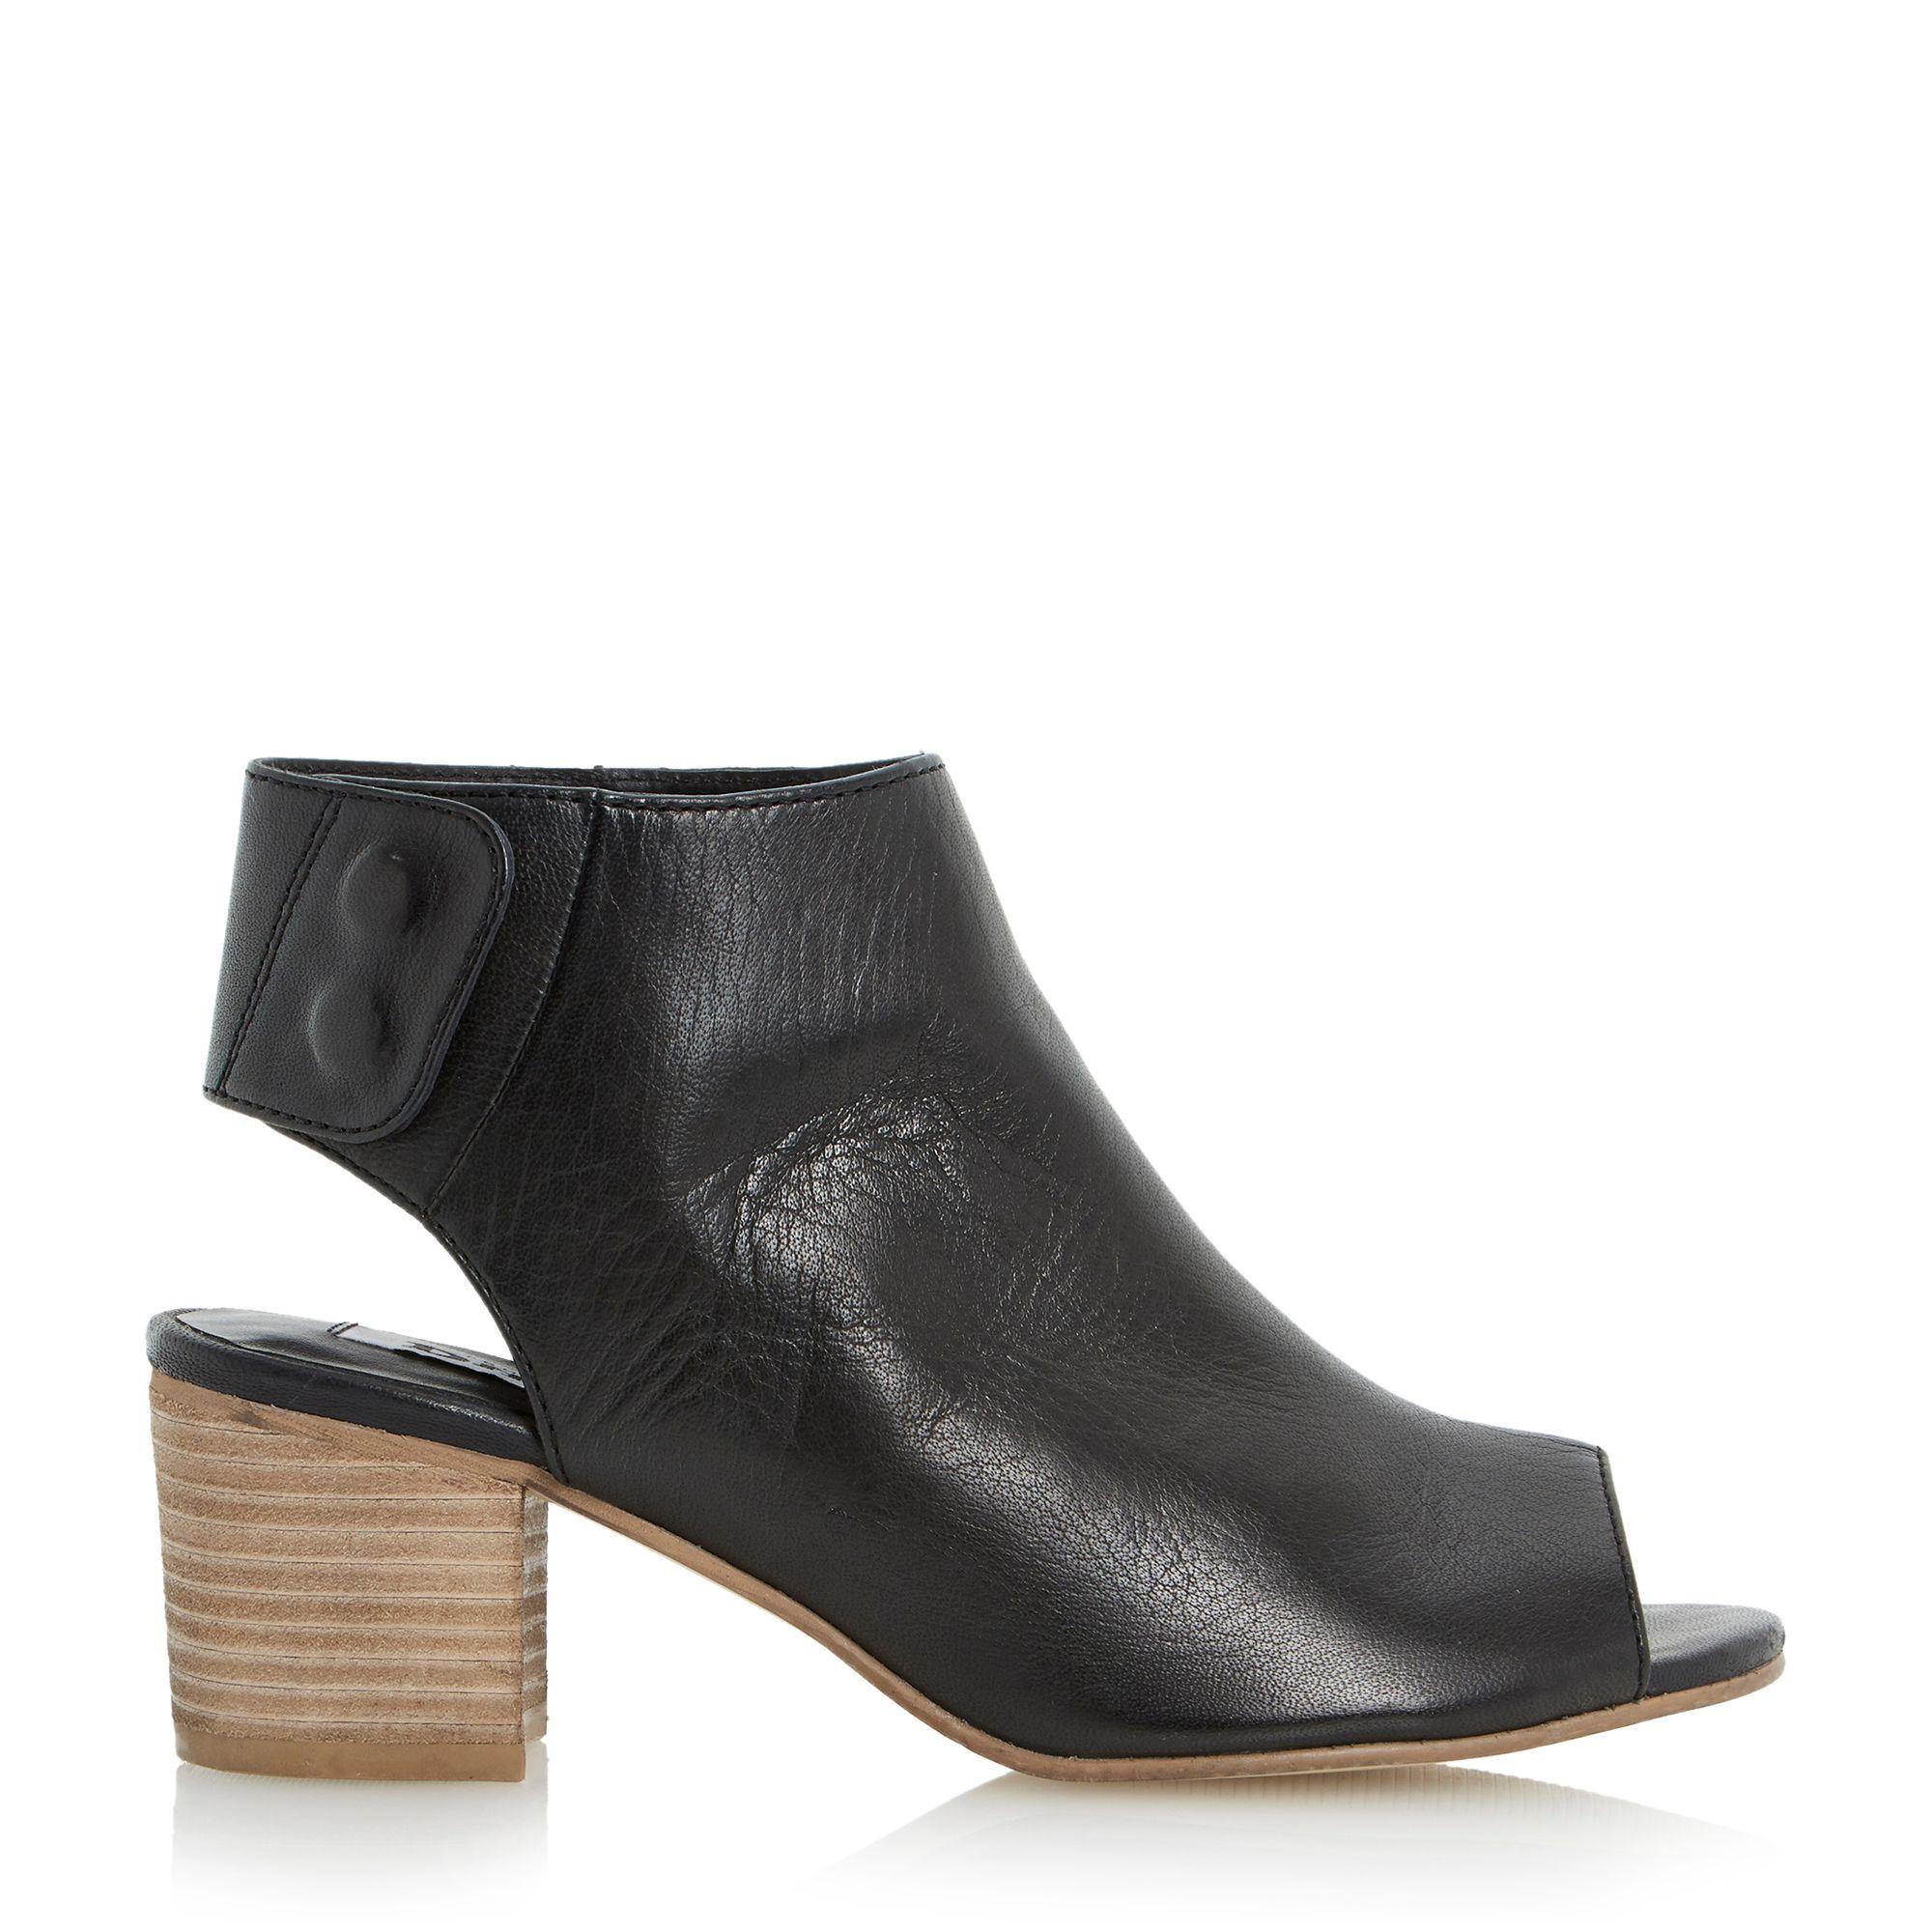 dune joanna softy shoe boot in black lyst